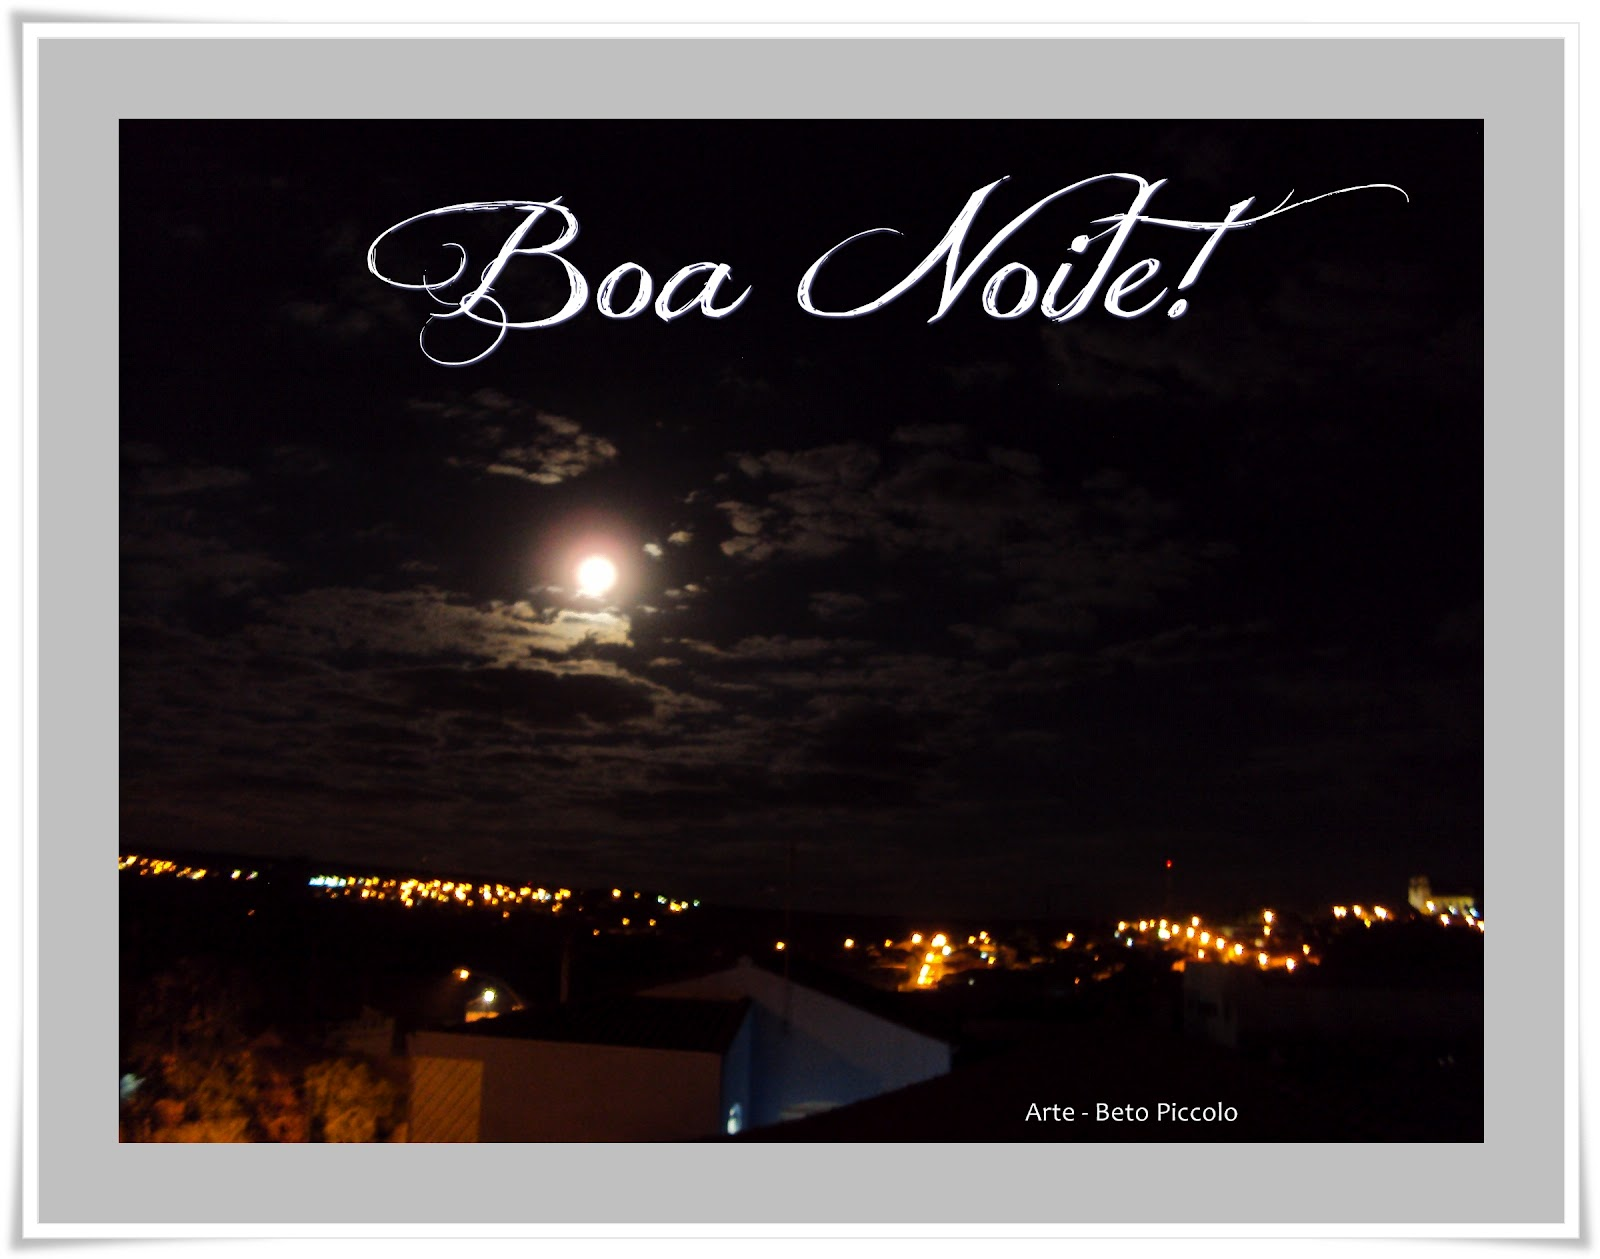 24 Best Images About Boa Noite On Pinterest: Beto Piccolo: Boa Noite